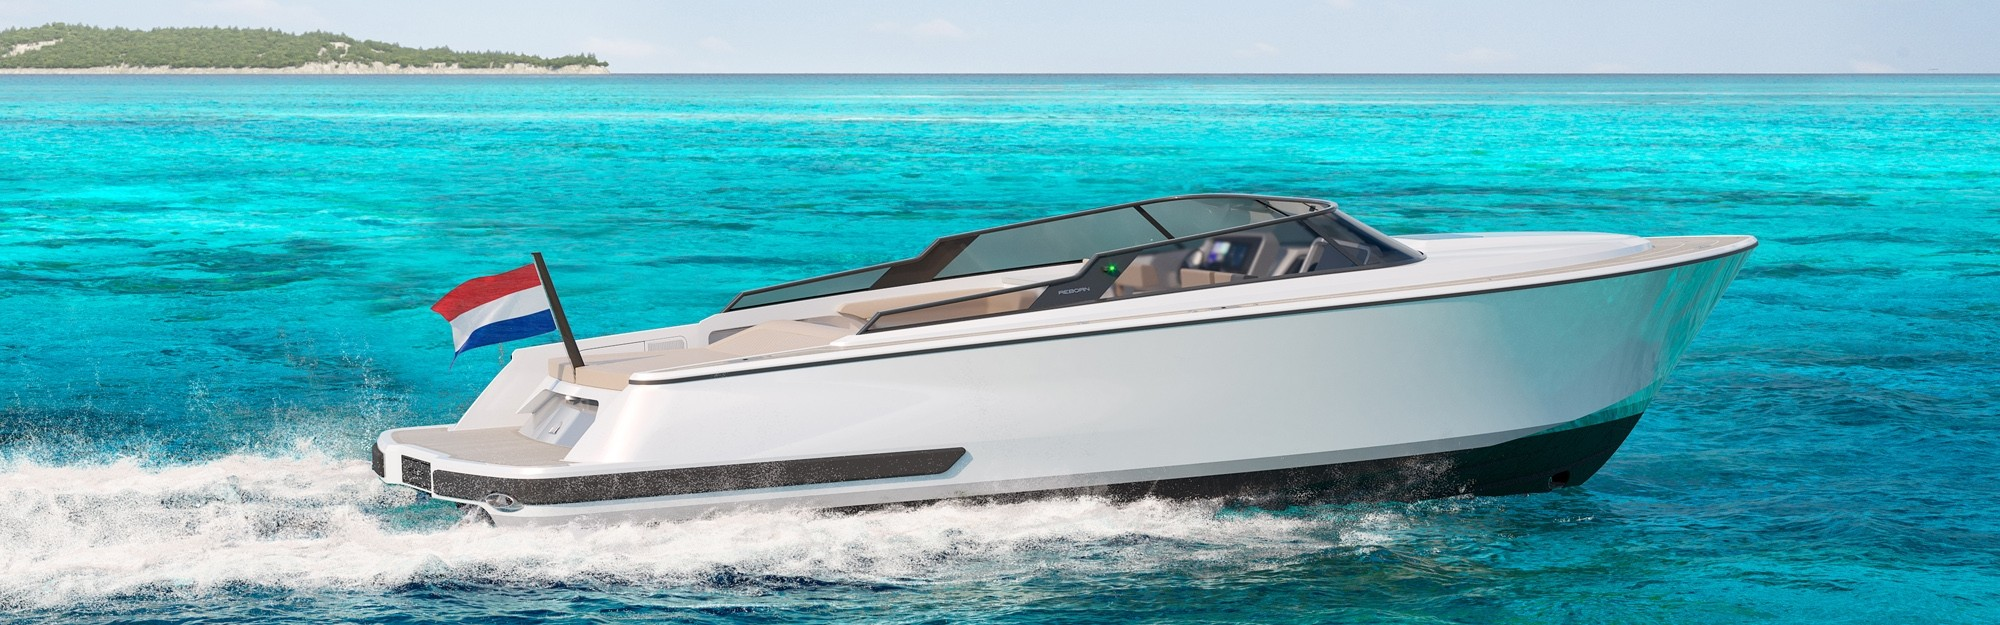 Reborn-Yachts-40R_1